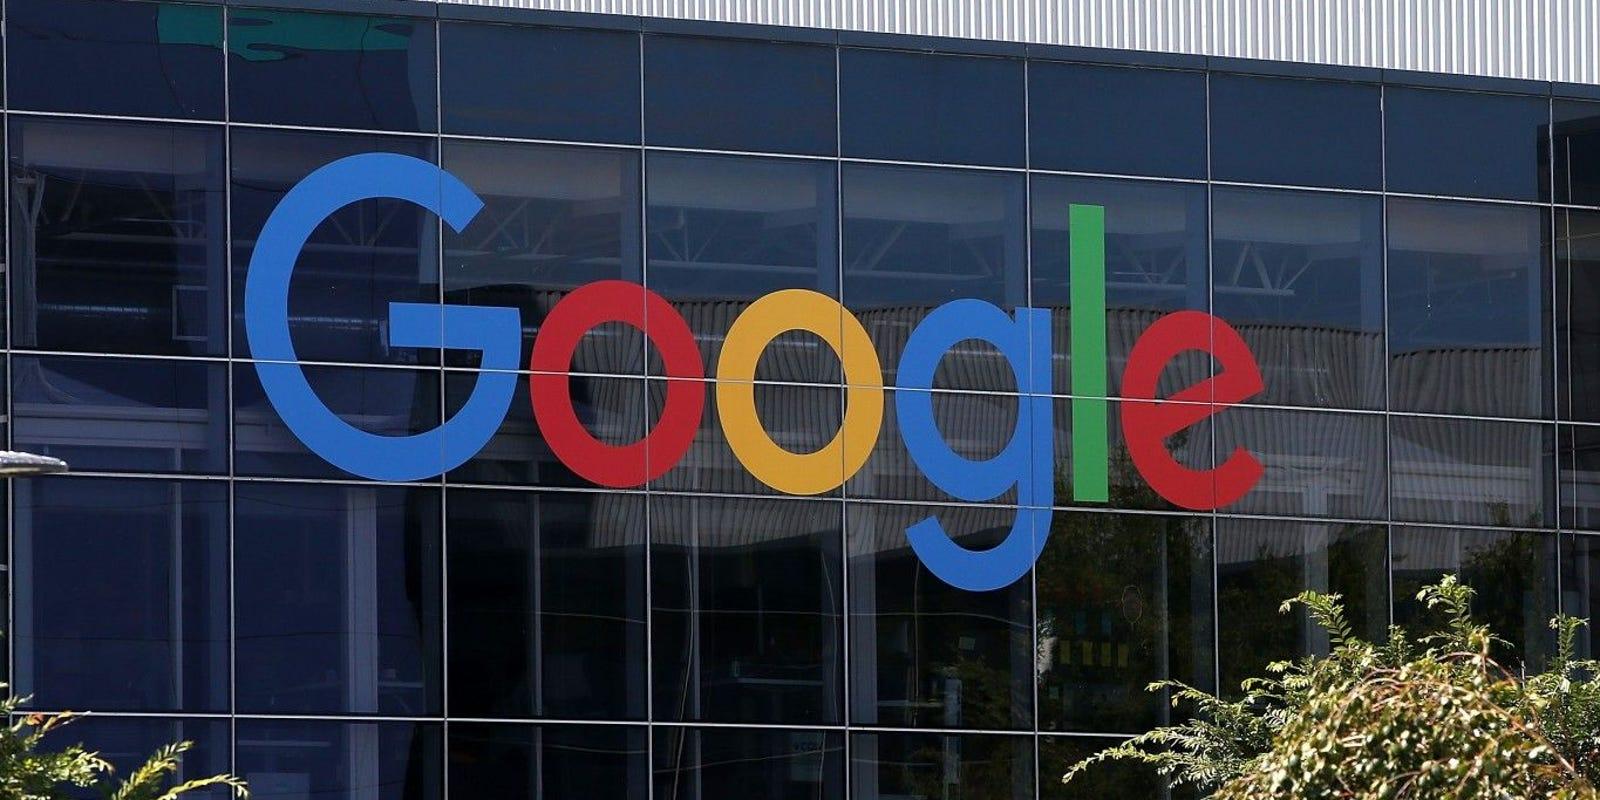 Google's new Pixels, Chromecast and Nest speaker expected at event